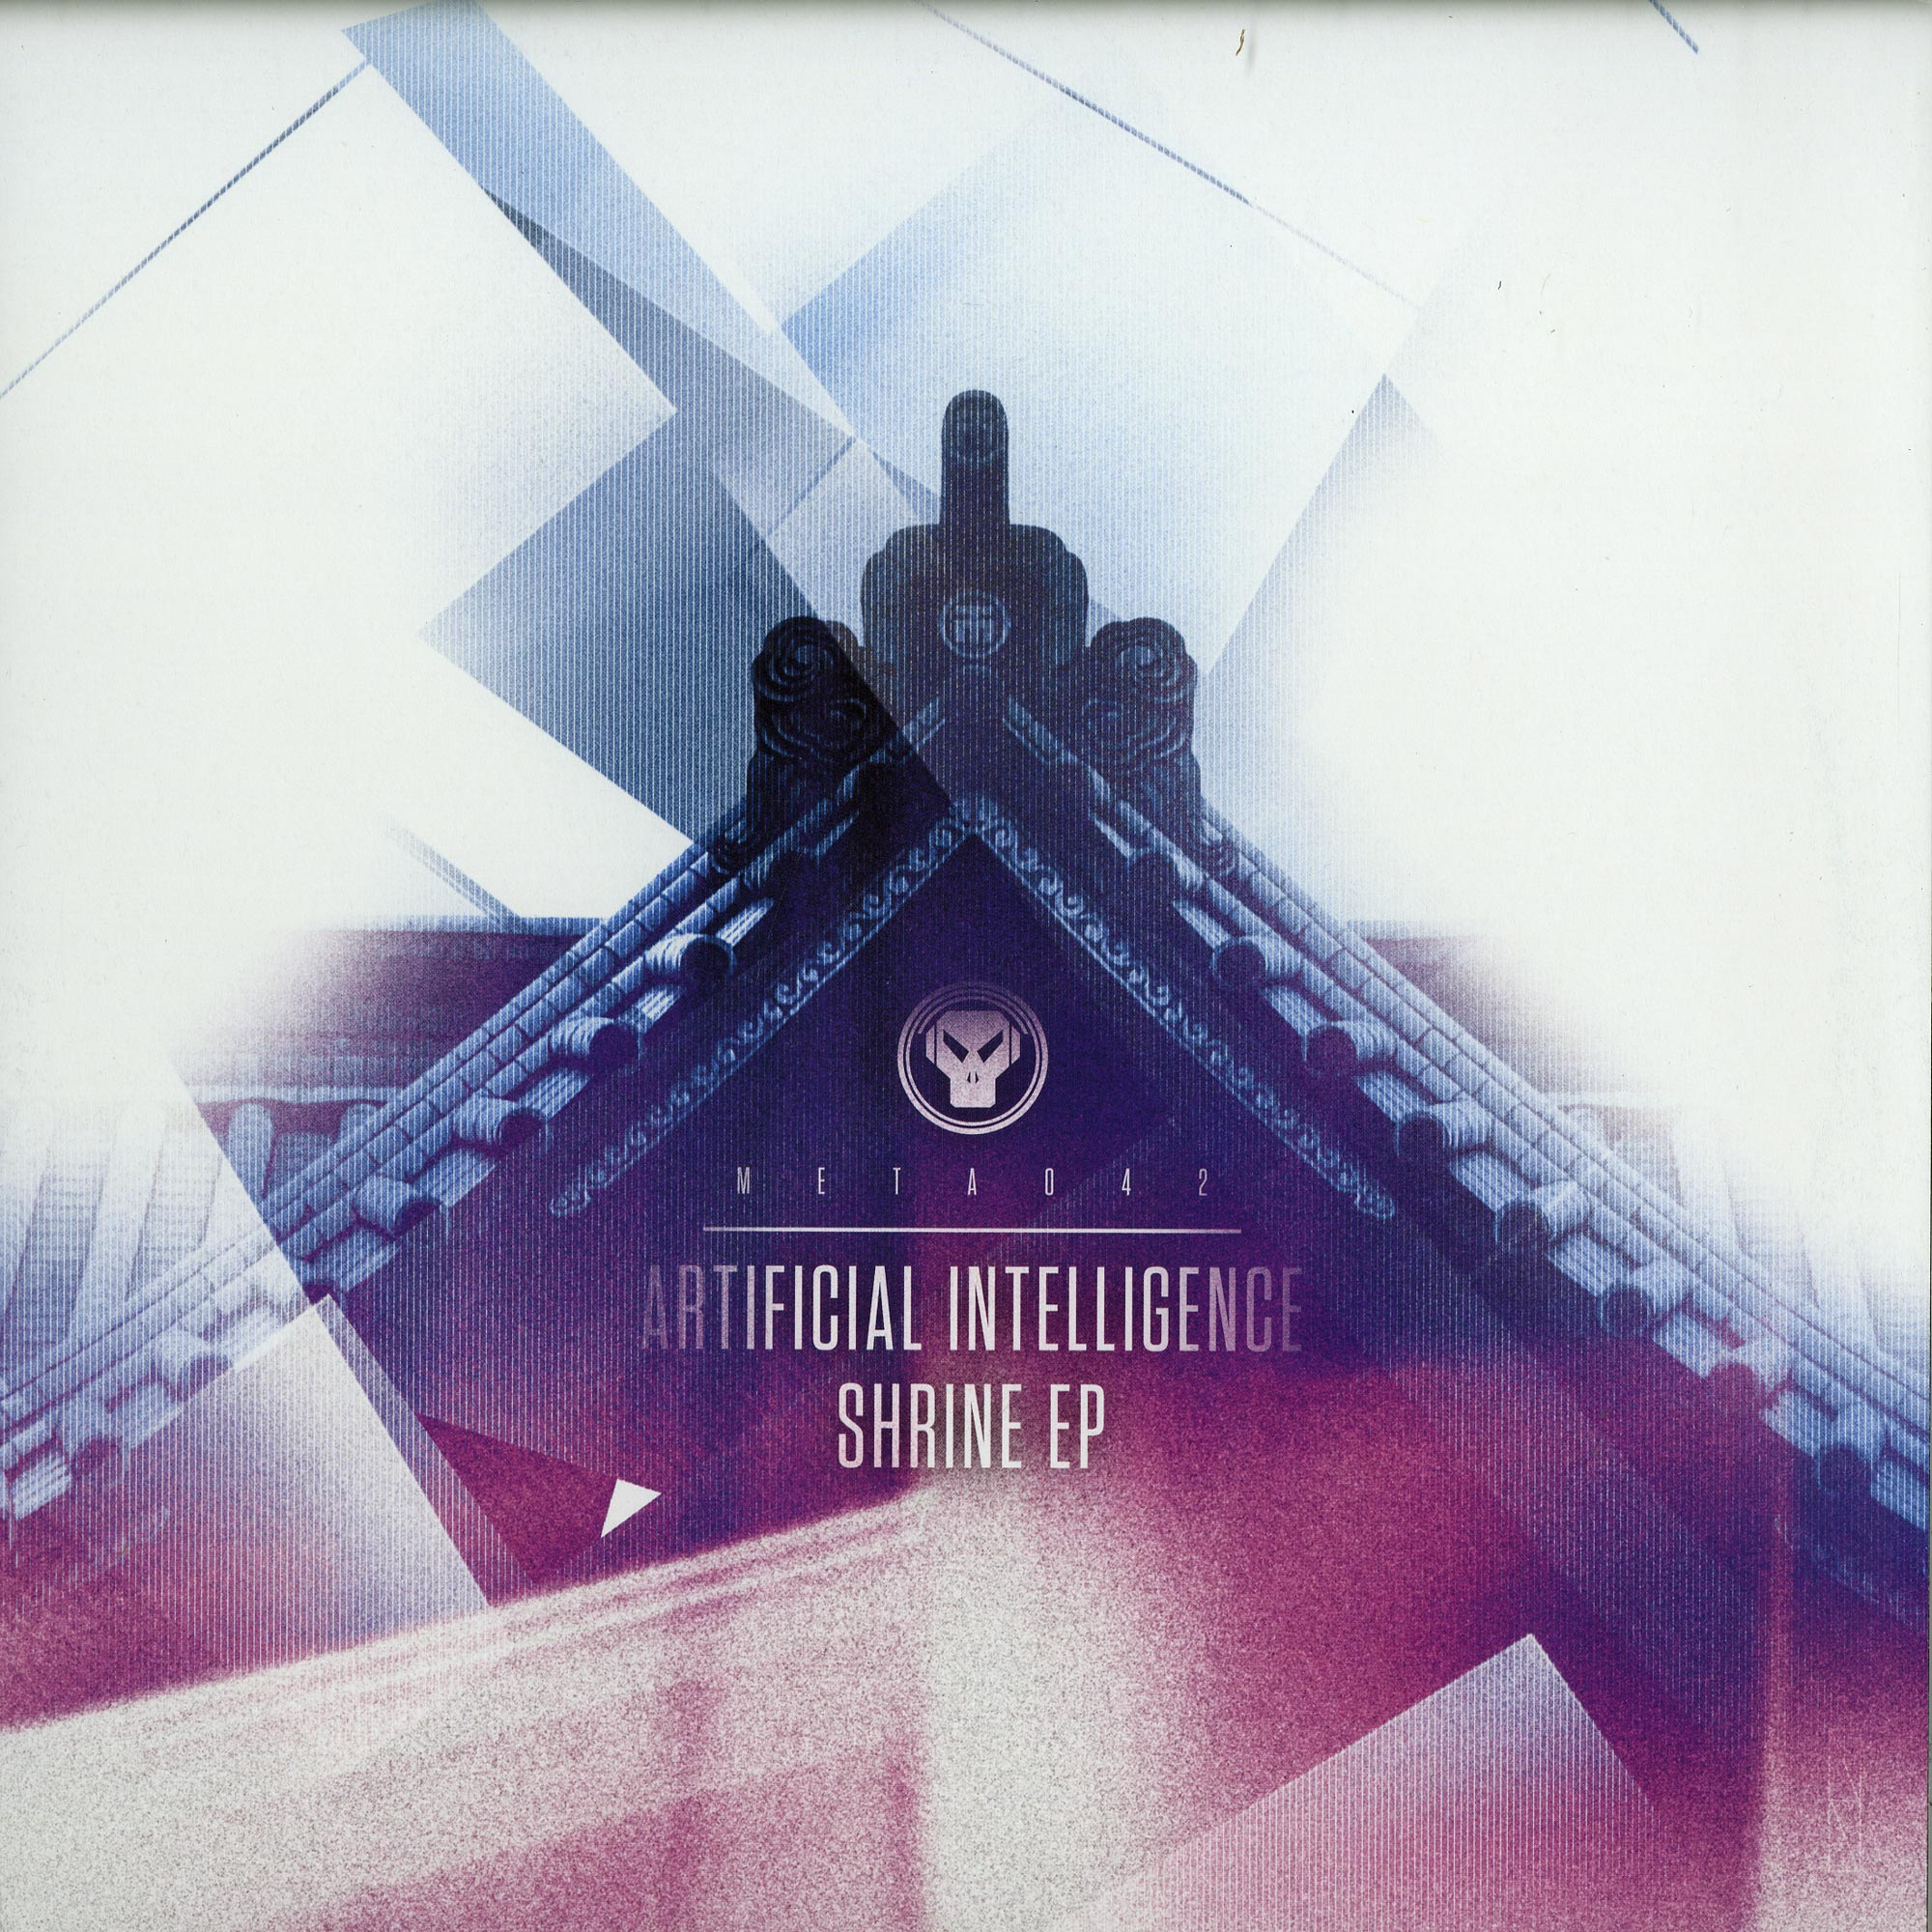 Artificial Intelligence - SHRINE EP